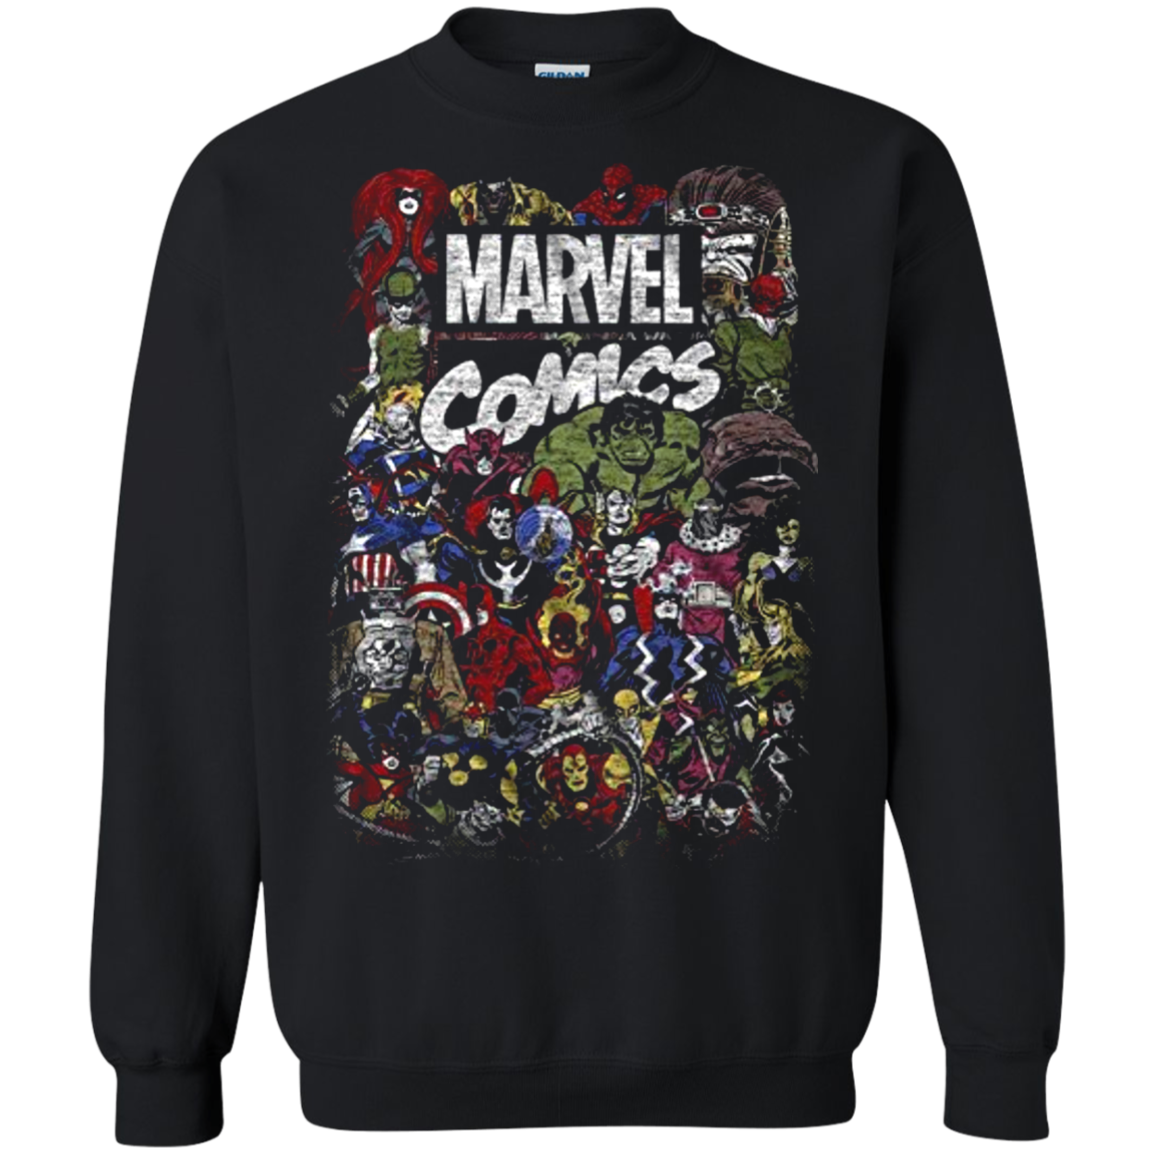 Comics Logo Thor Hulk Iron Man Avengers Spiderman Daredevil Strange Loki Thanos T shirt hoodie sweater SweatShirt